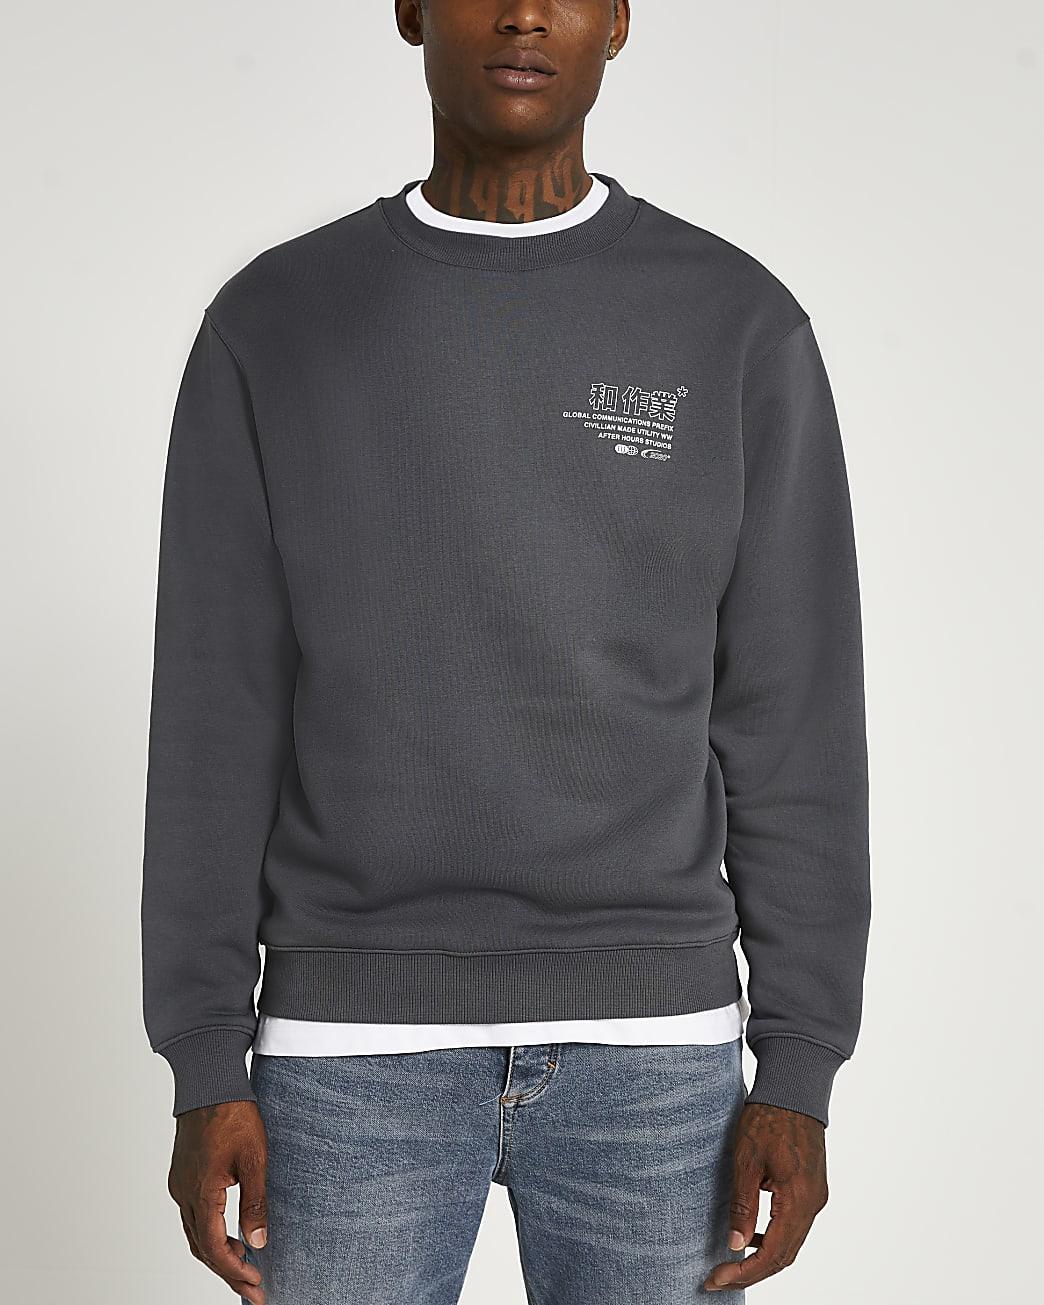 Grey graphic sweatshirt